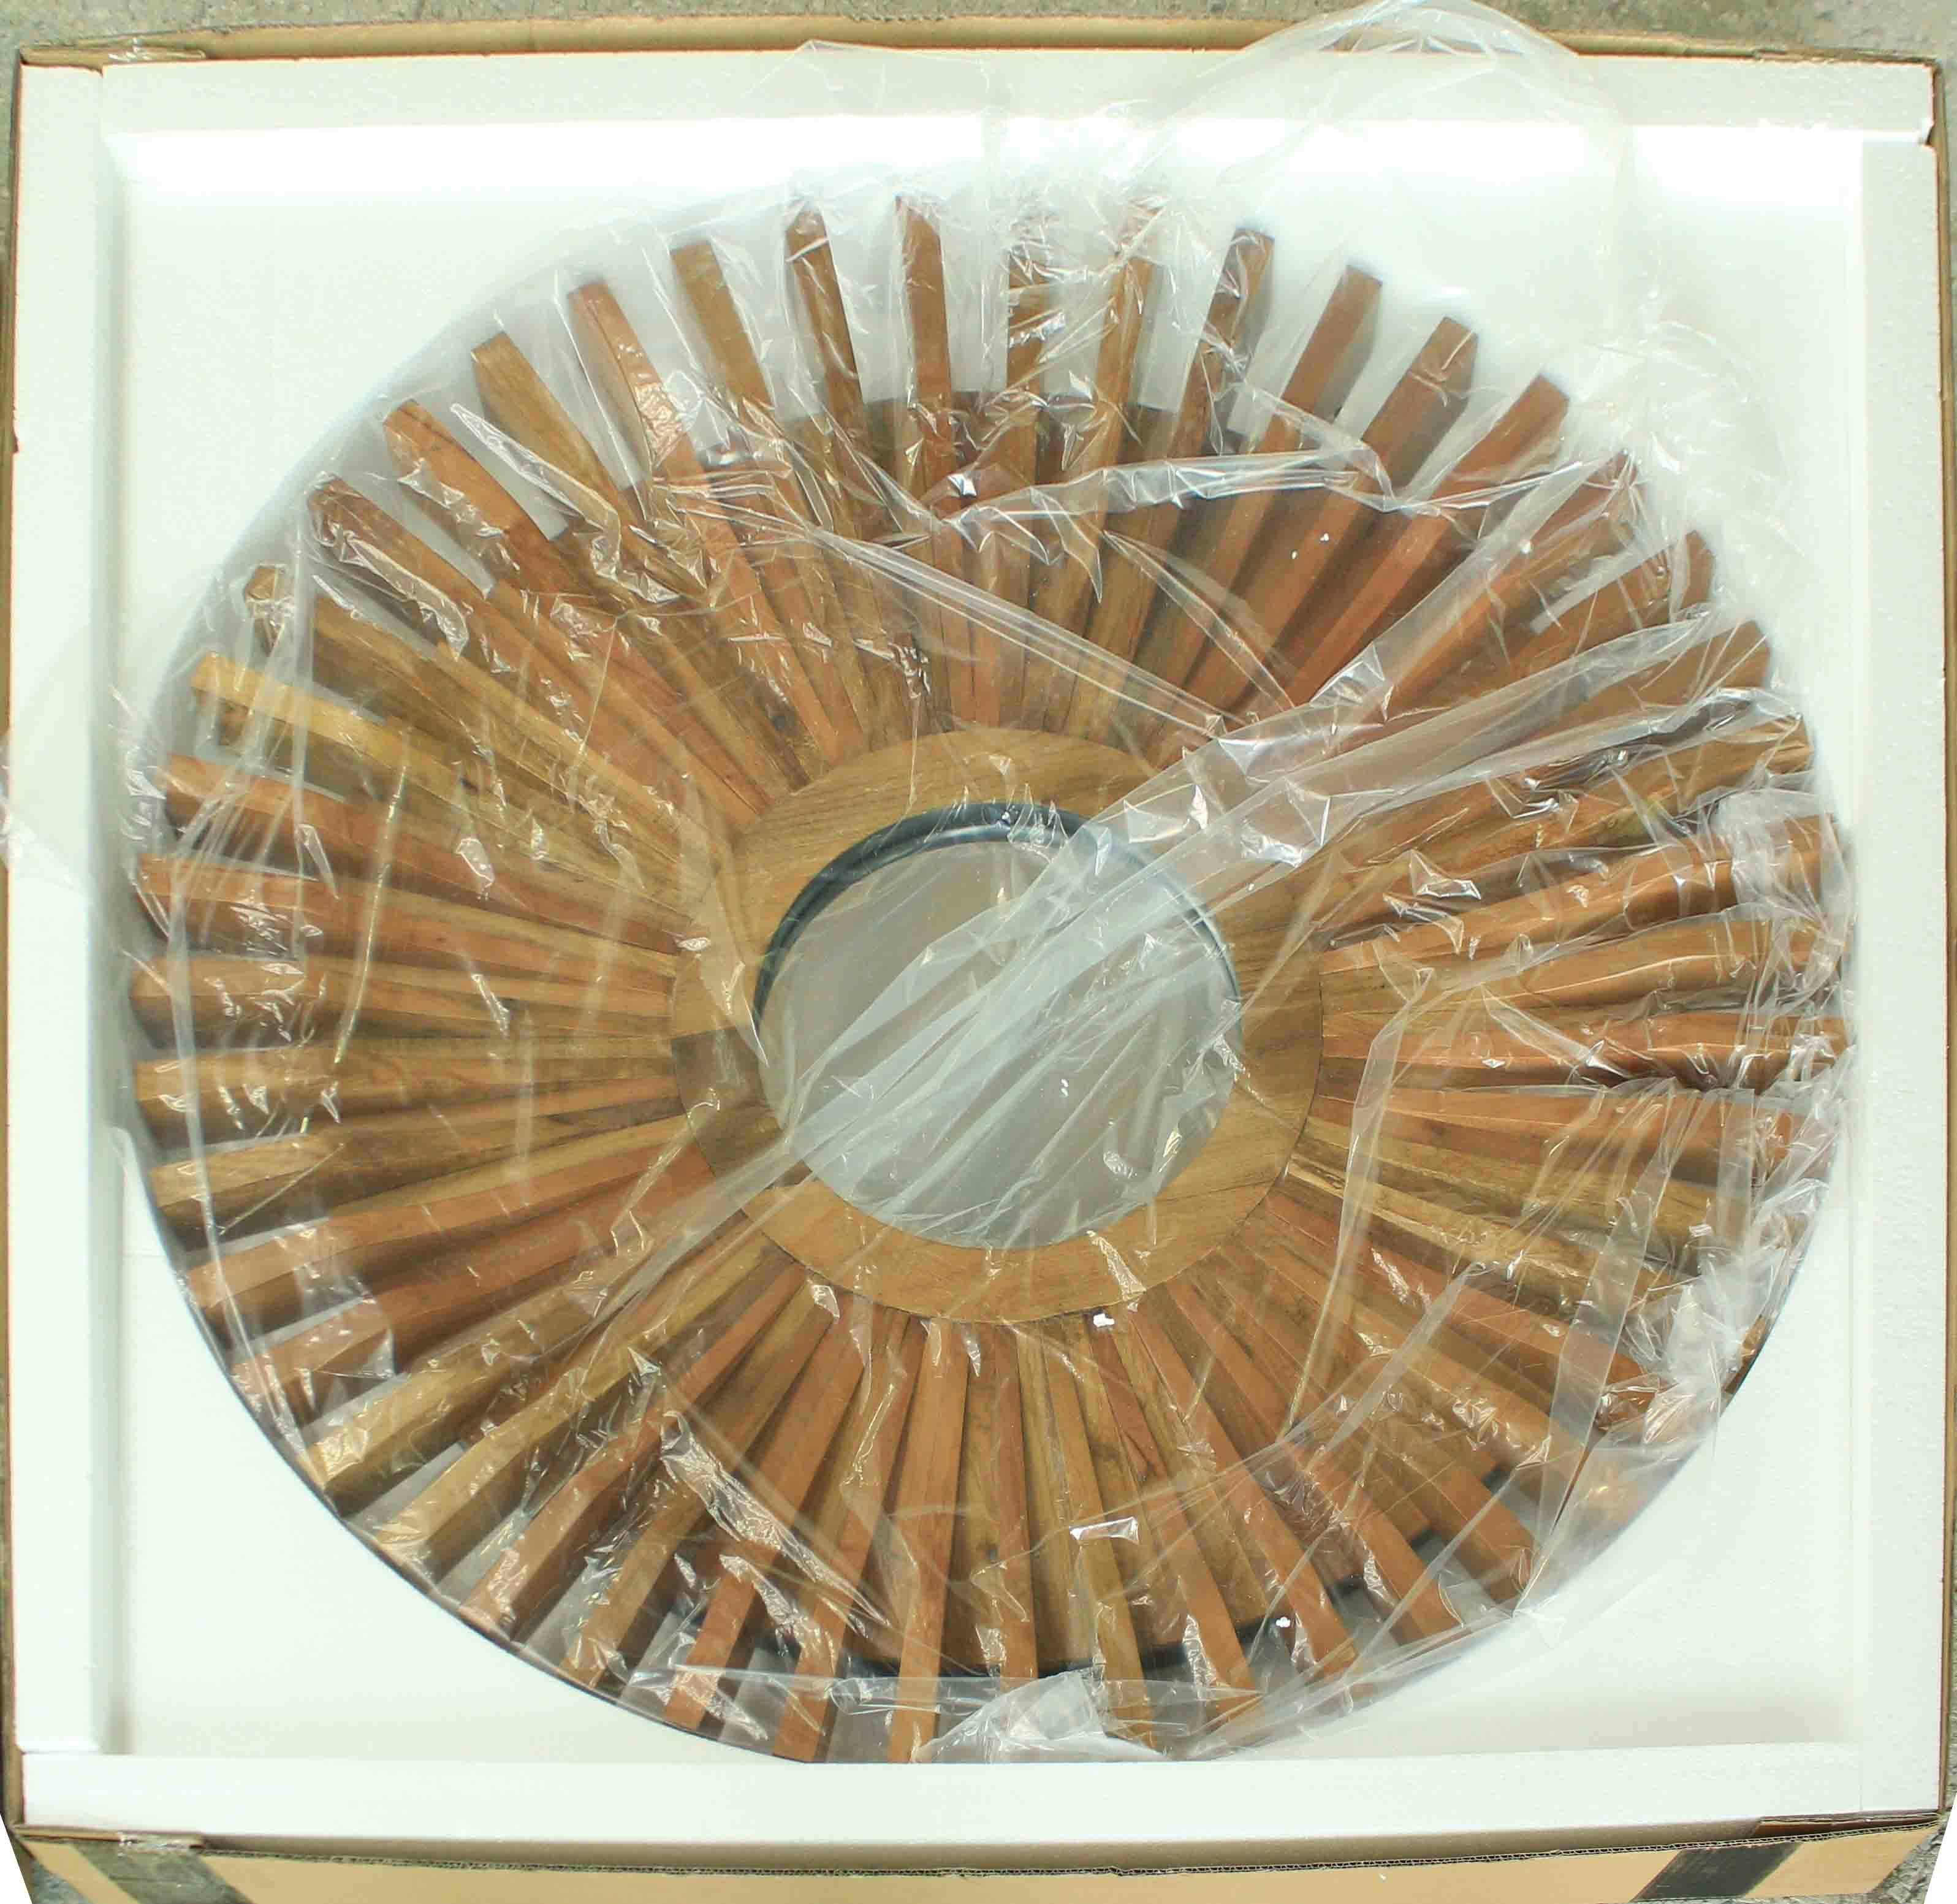 Home Decorative Solid Wood Sunflower Shape Modern Wall Mirror (LH-W17033)